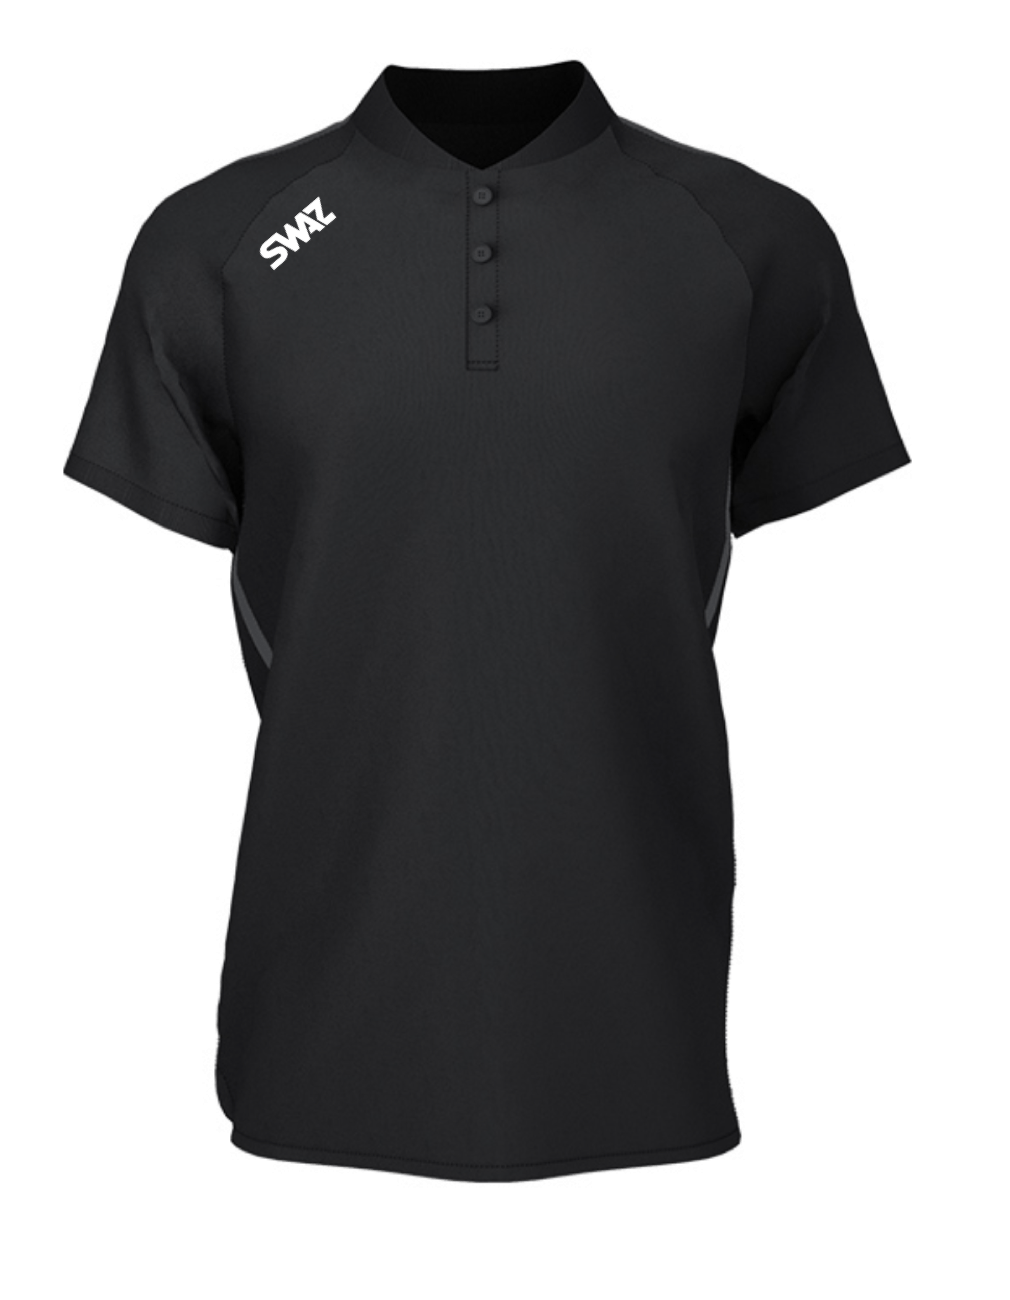 SWAZ Elite Black Polo Shirt | Football Teamwear